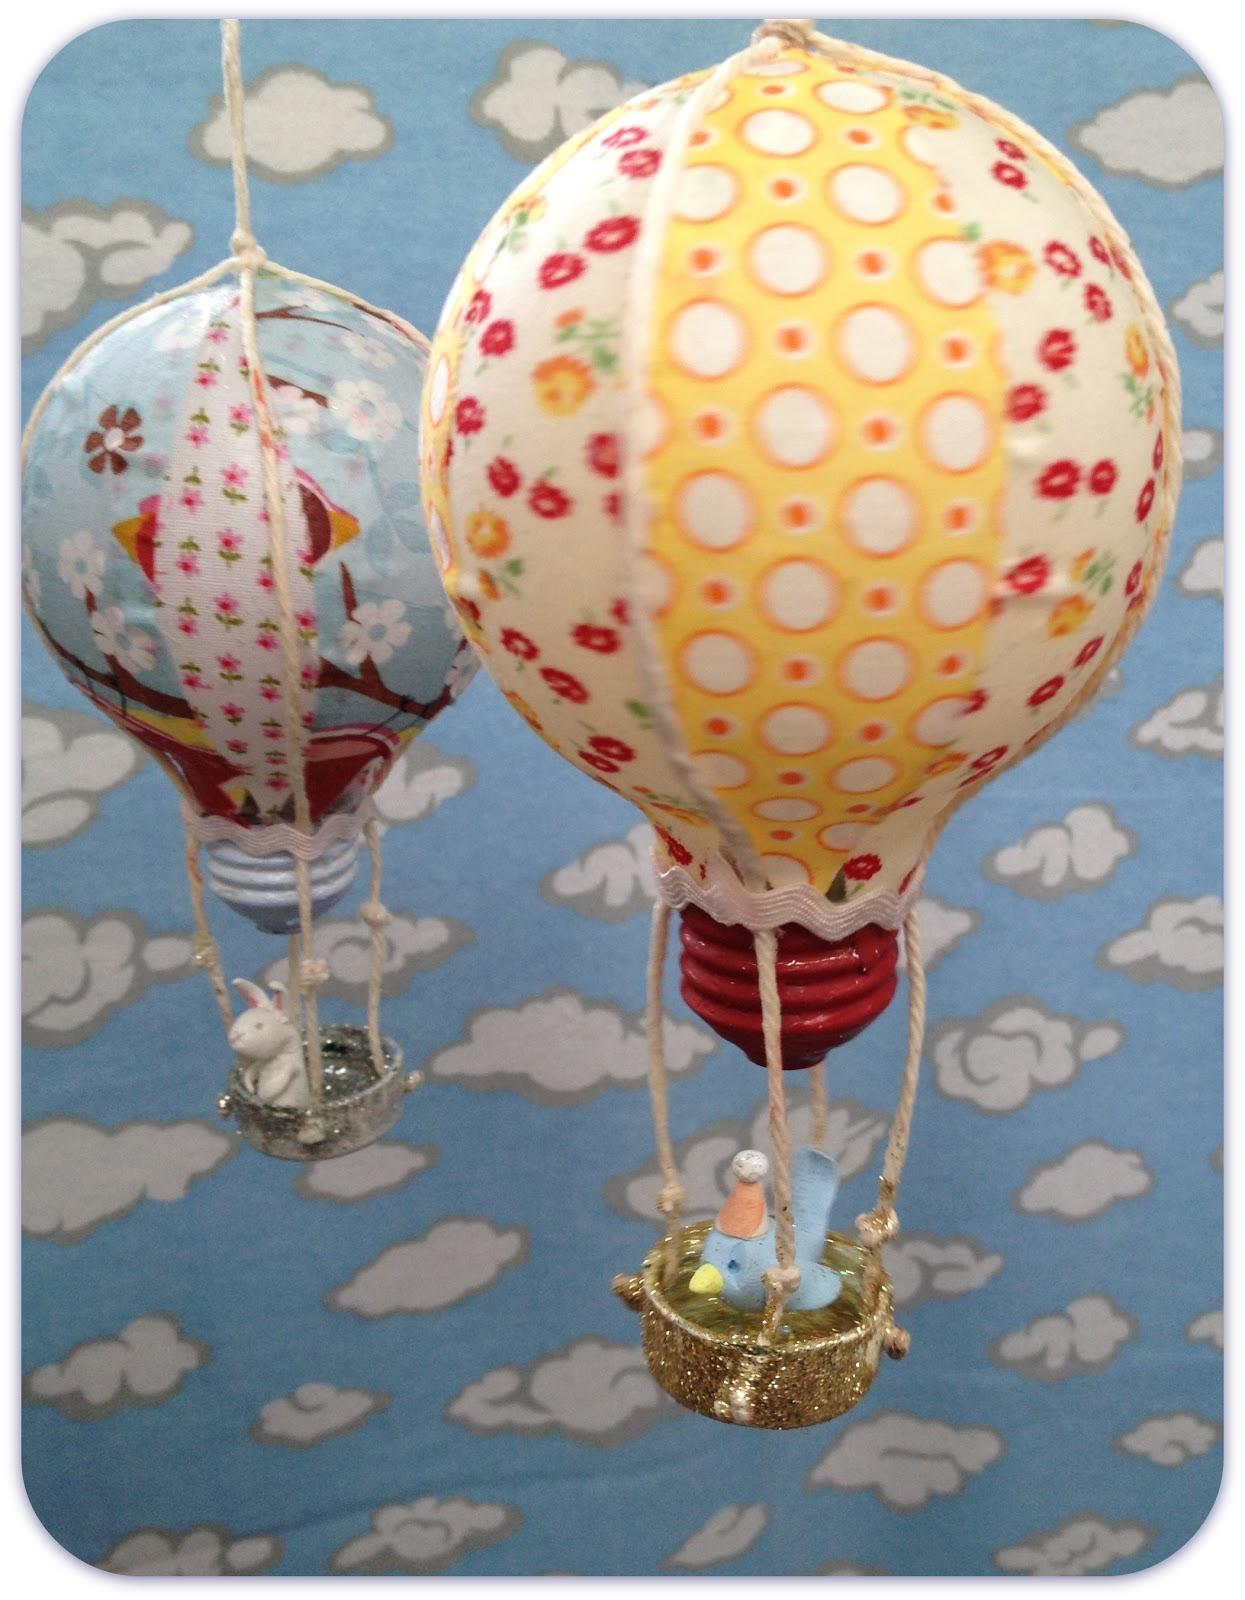 http://3.bp.blogspot.com/-c66RVW3WyRA/T2bI-74M4QI/AAAAAAAAJwU/IejN_c4KY3A/s1600/light_bulb_a_air_balloon_diy%20051-1.JPG